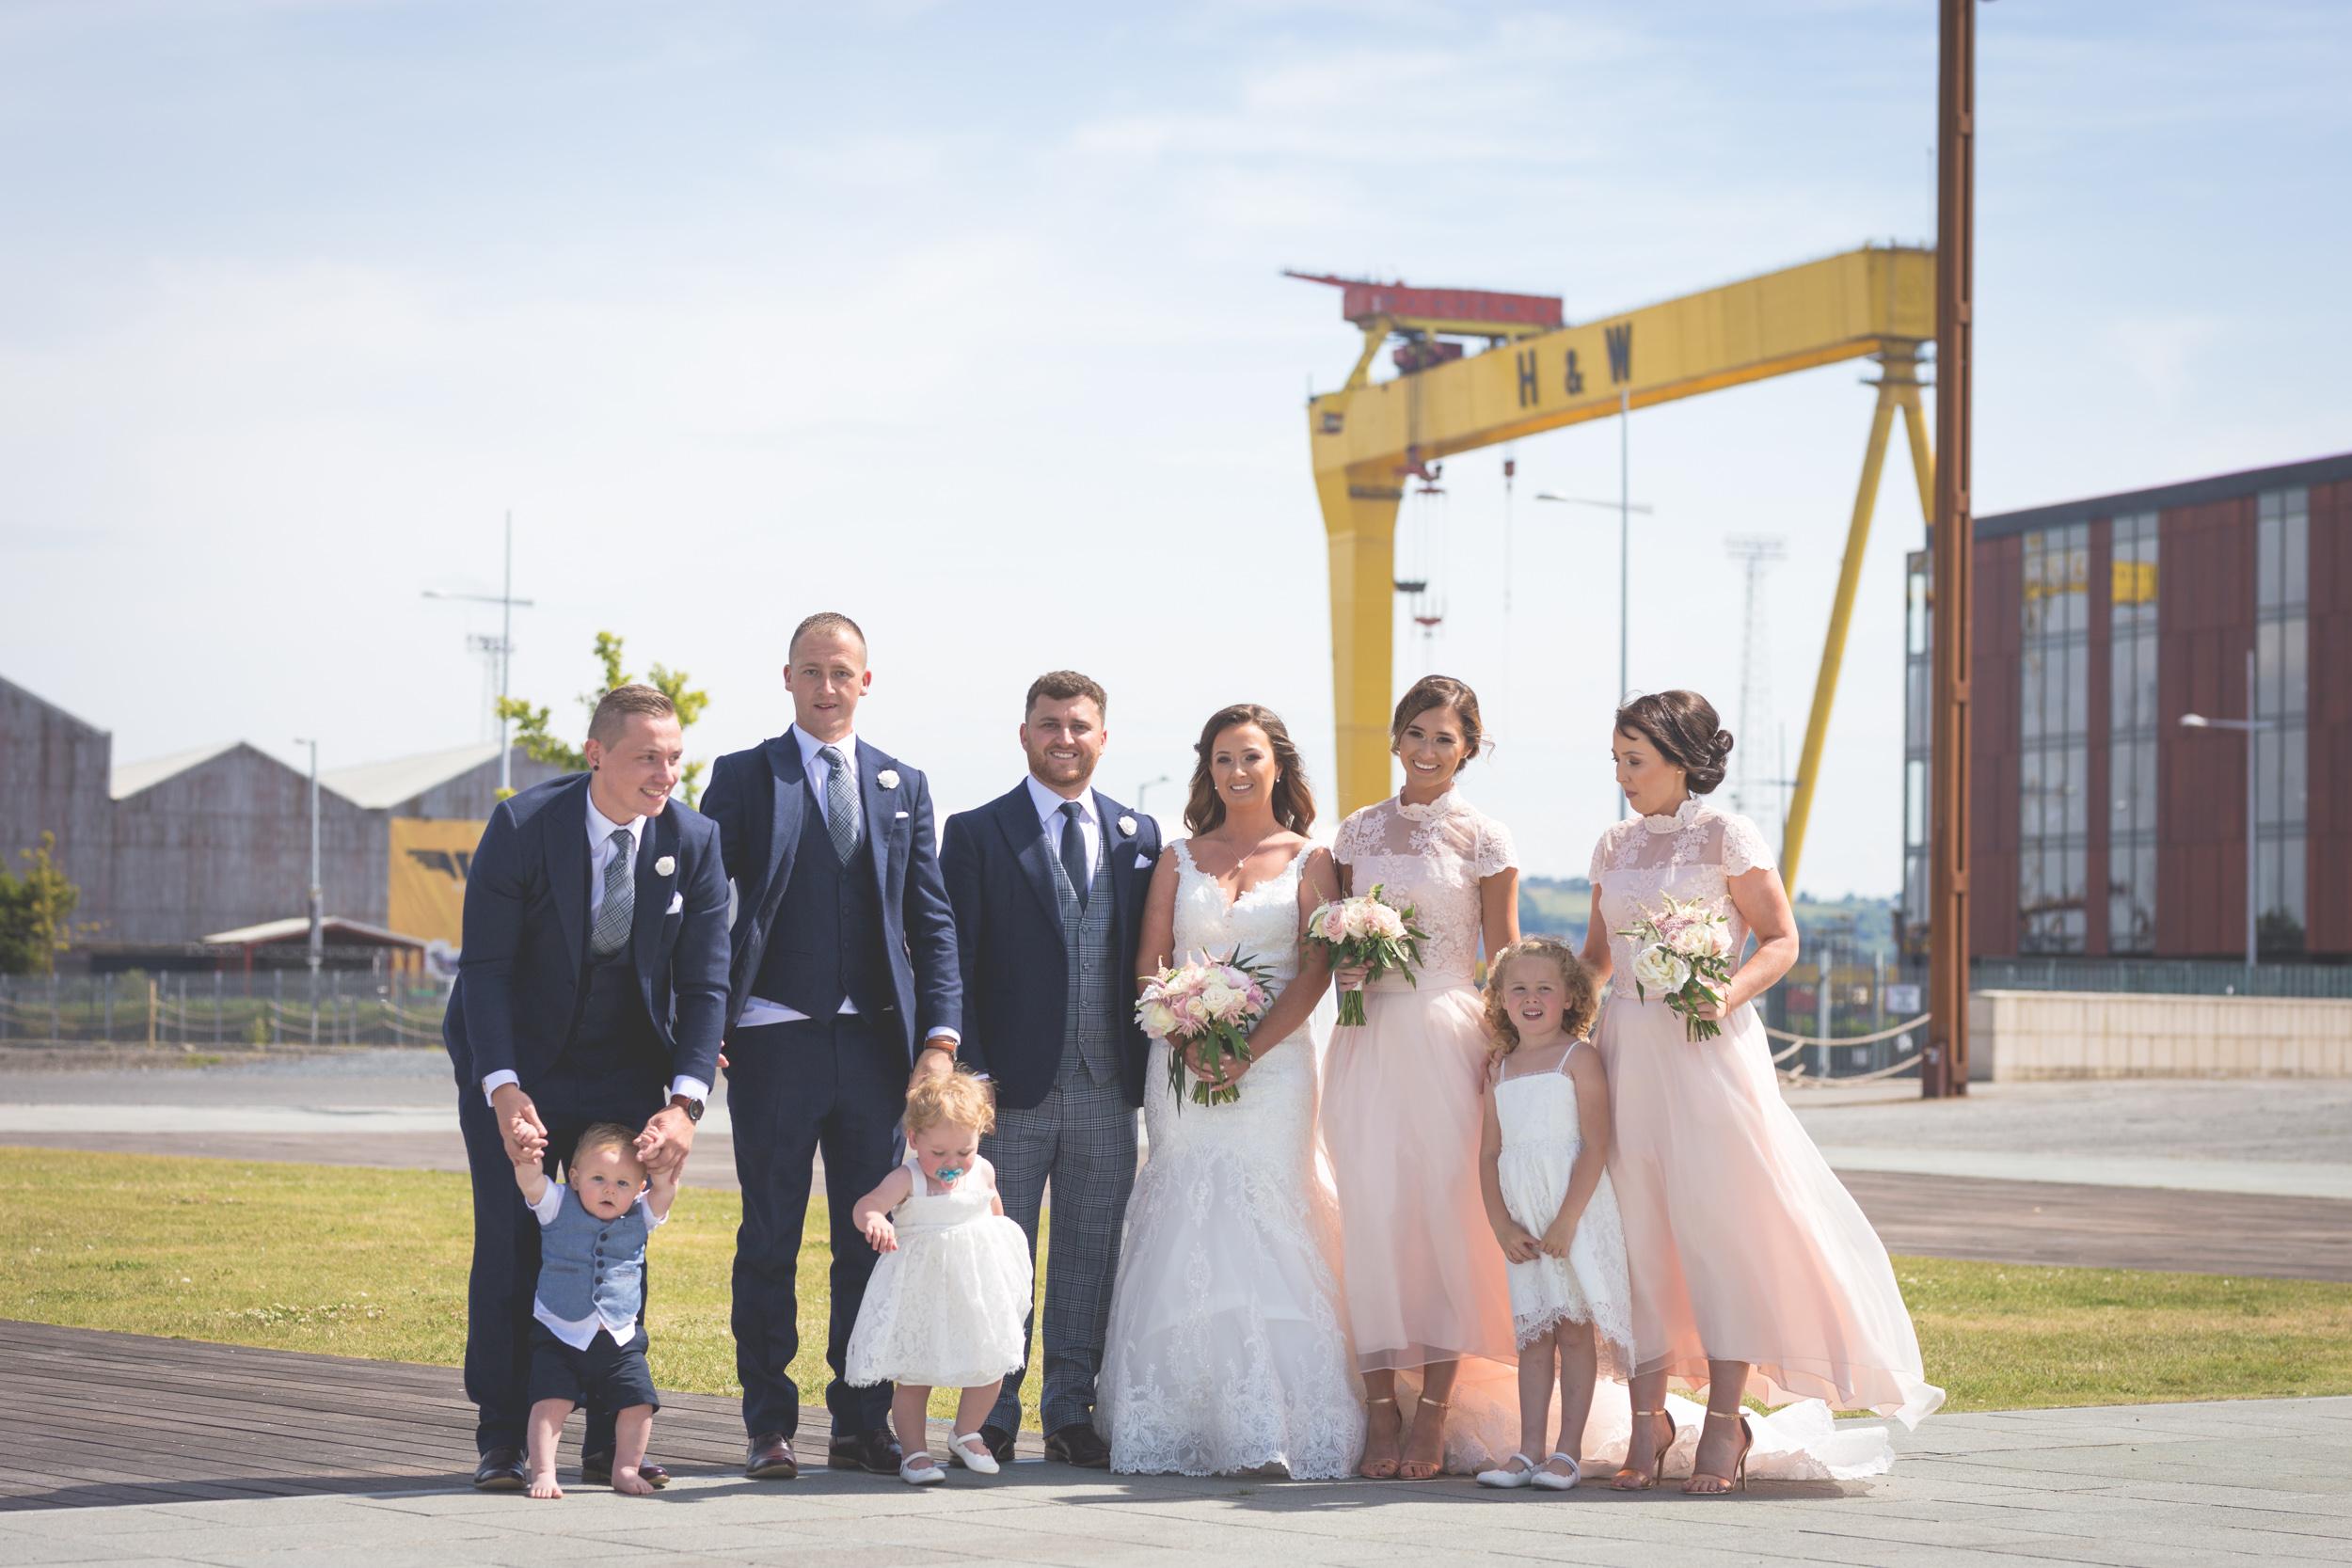 Brian McEwan   Northern Ireland Wedding Photographer   Rebecca & Michael   Portraits-51.jpg